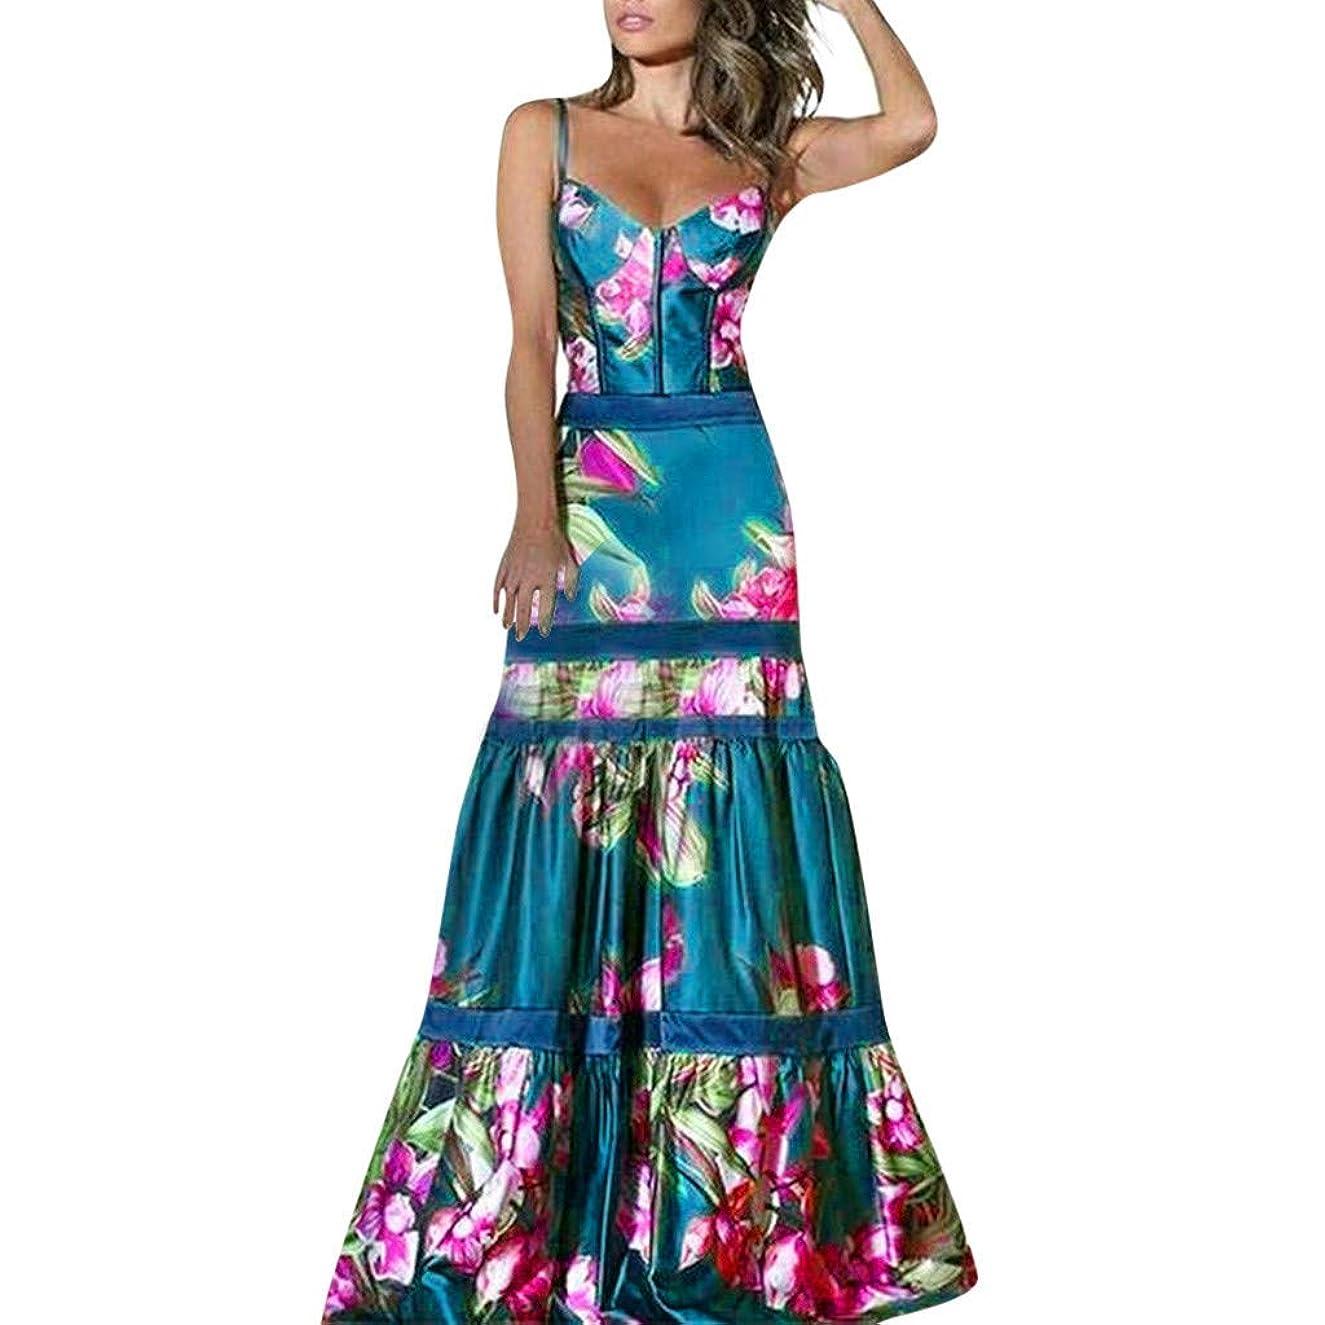 MIS1950s Women Summer Print Dress Women Elegant V-Neck Sleeveless Maxi Dresses Club Dress